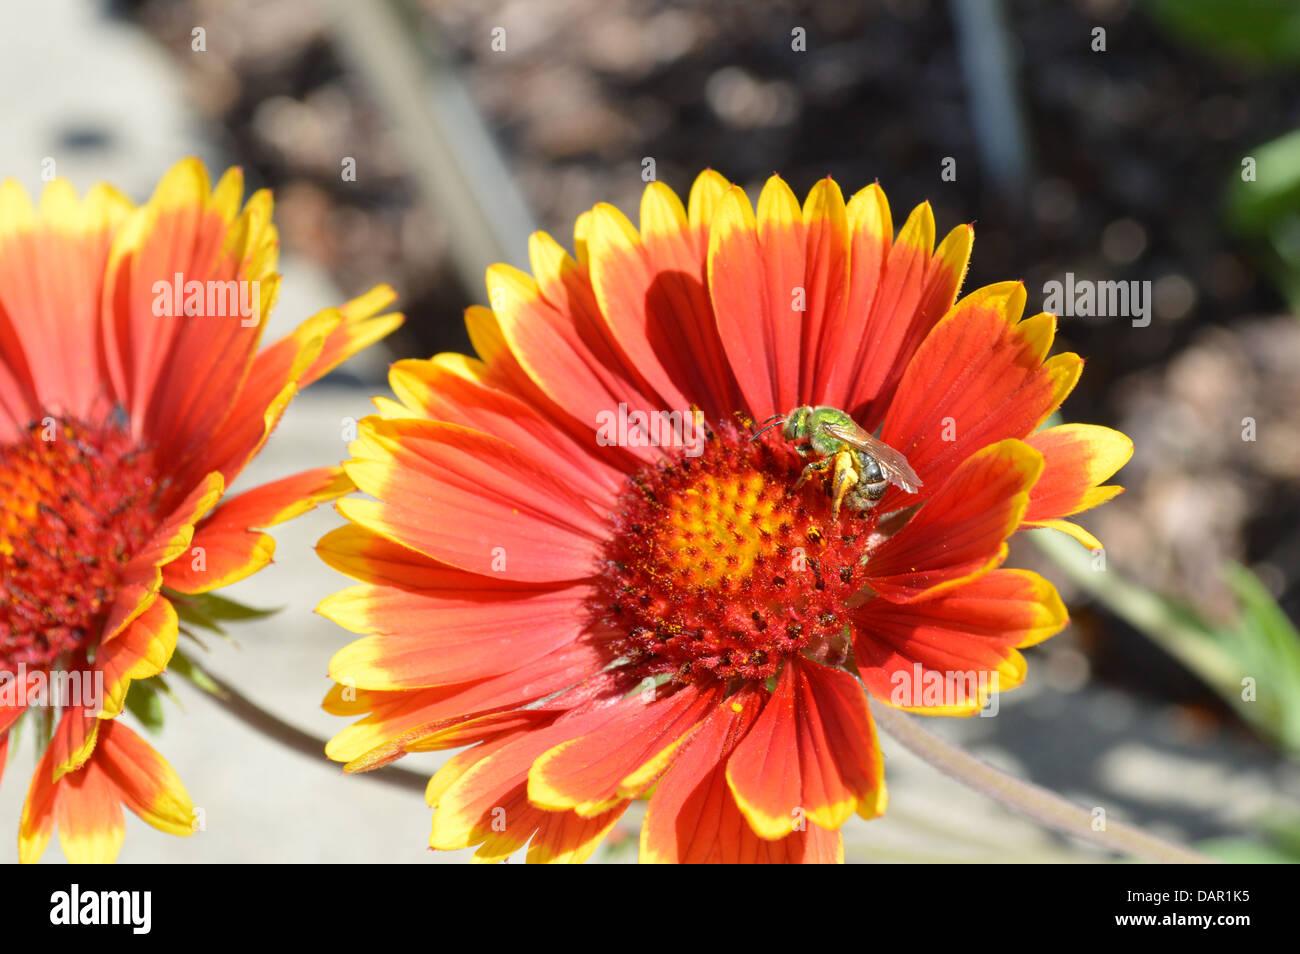 sweat bee, pollinating, dazzler daisy - Stock Image